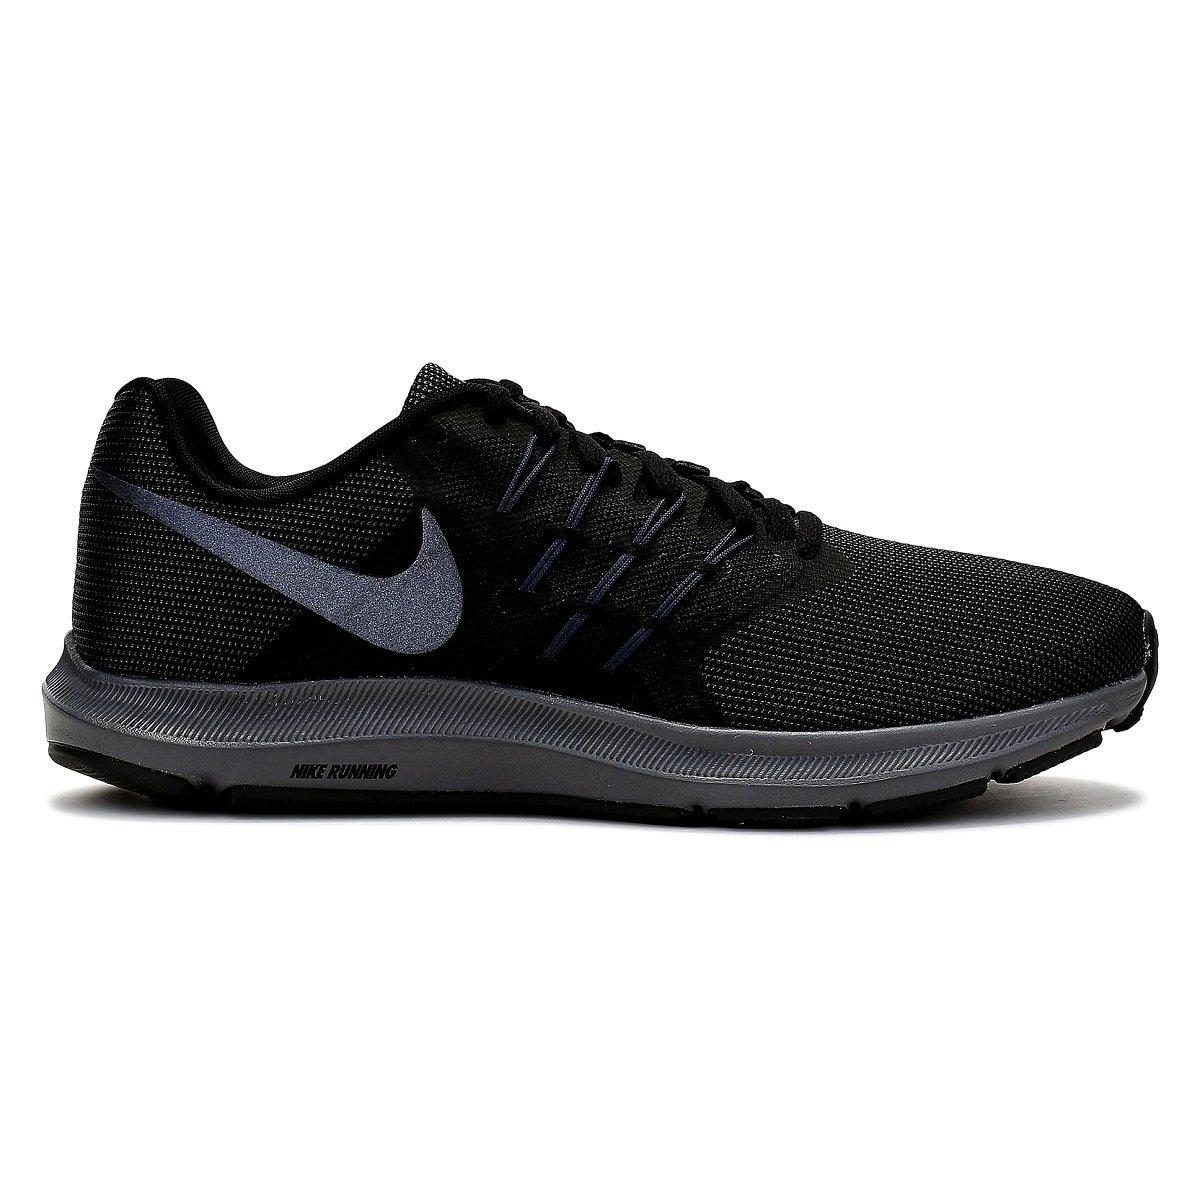 232ee3ca8f Tênis Masculino Nike Run Swift 908989-010 - Preto Cinza - Calçados ...